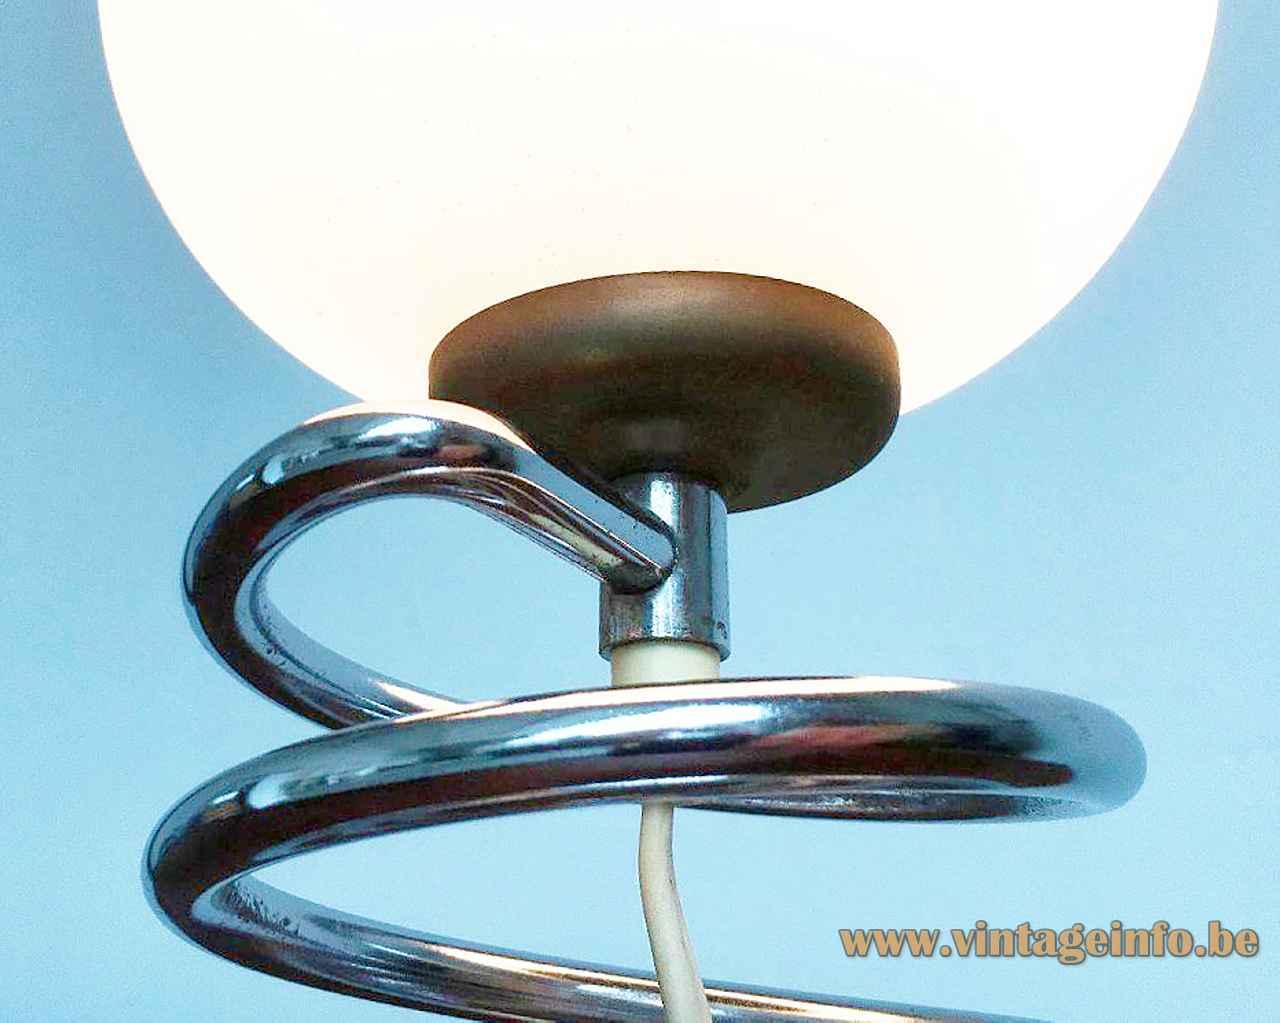 Honsel Leuchten spiral table lamp chrome spring rod base opal glass globe lampshade 1970s Germany